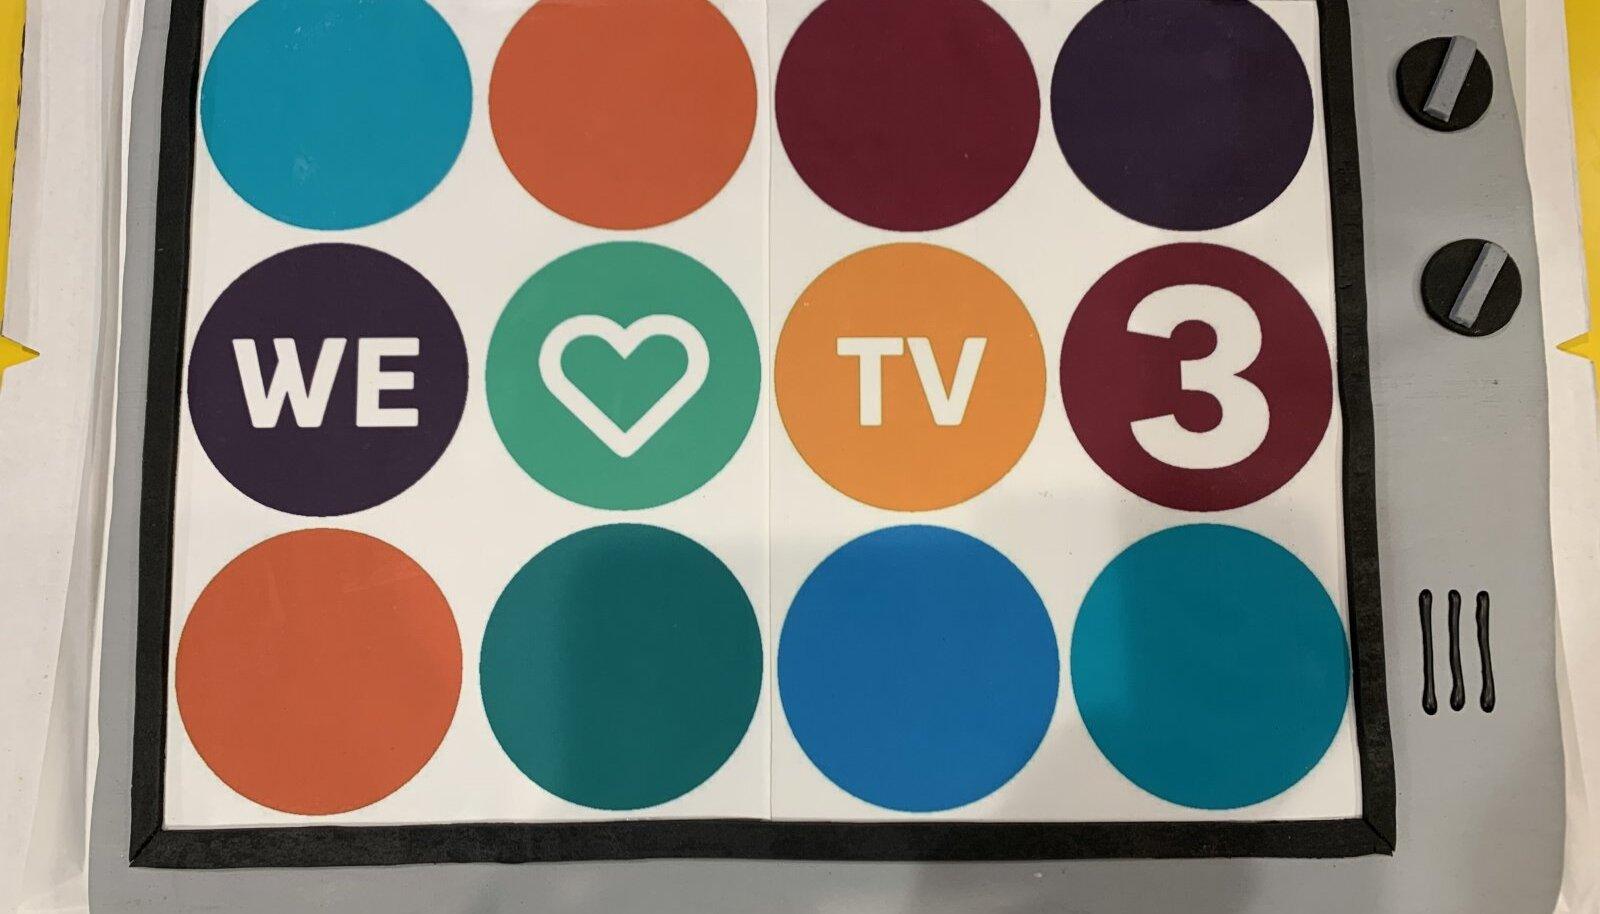 TV3 vana logo